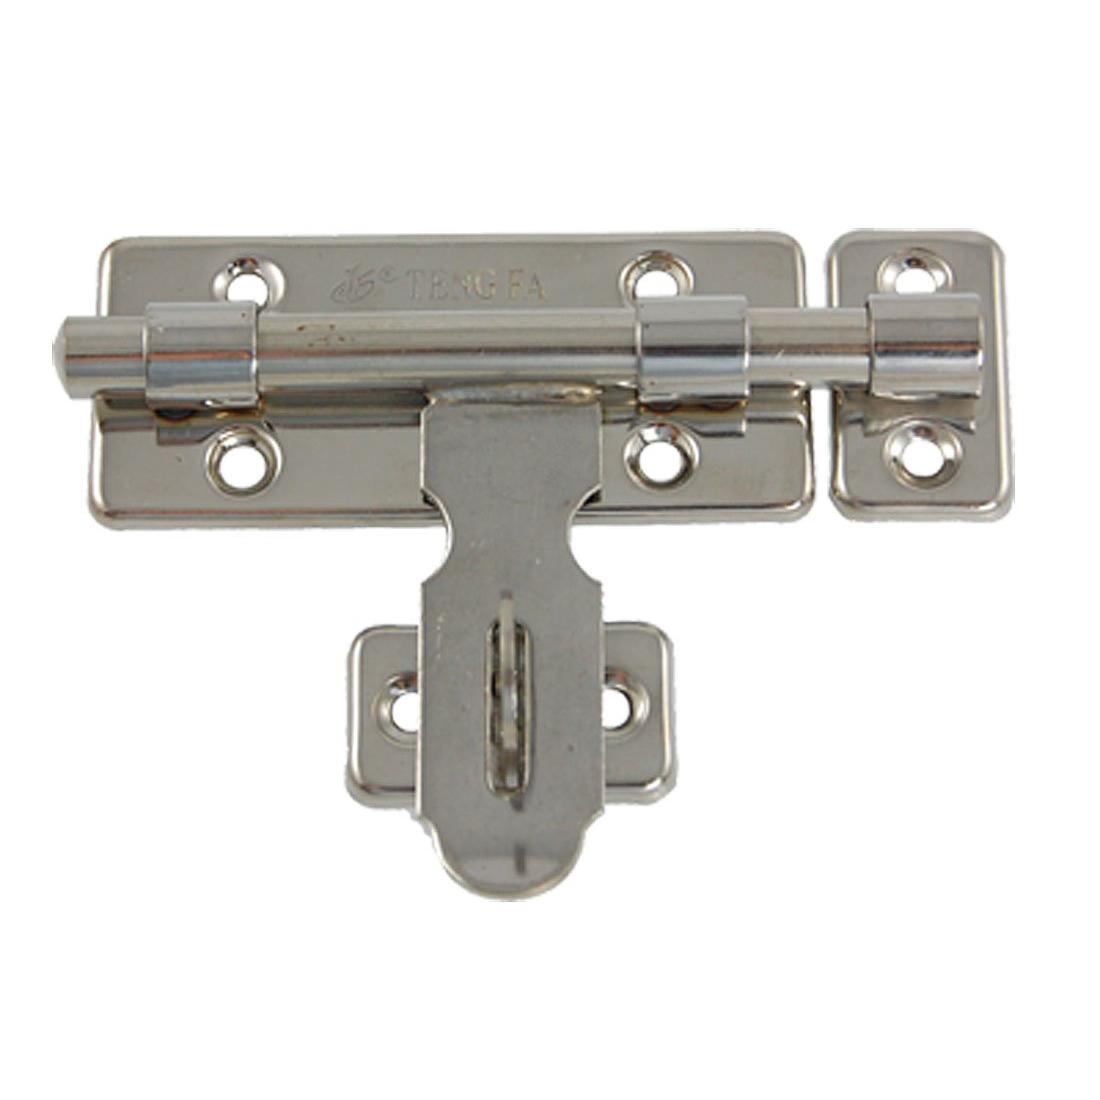 TENGFA Hardware Door Lock Barrel Bolt Latch Padlock Clasp Set D7Z2  sc 1 st  gaml.us & Wonderful Different Types Of Door Lock Names Ideas - Exterior ideas ...